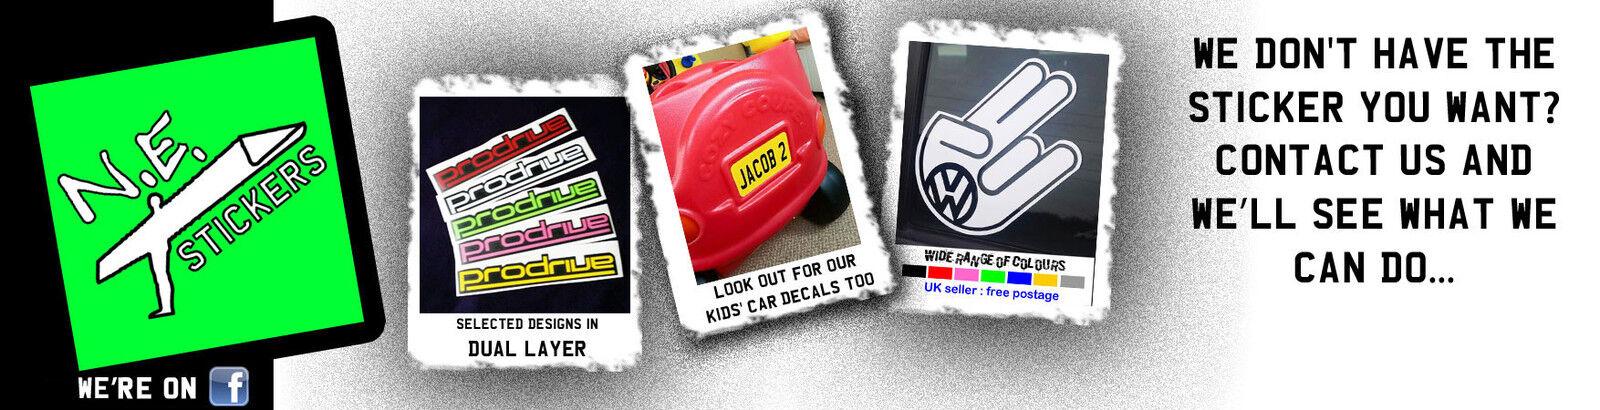 N.E.stickers